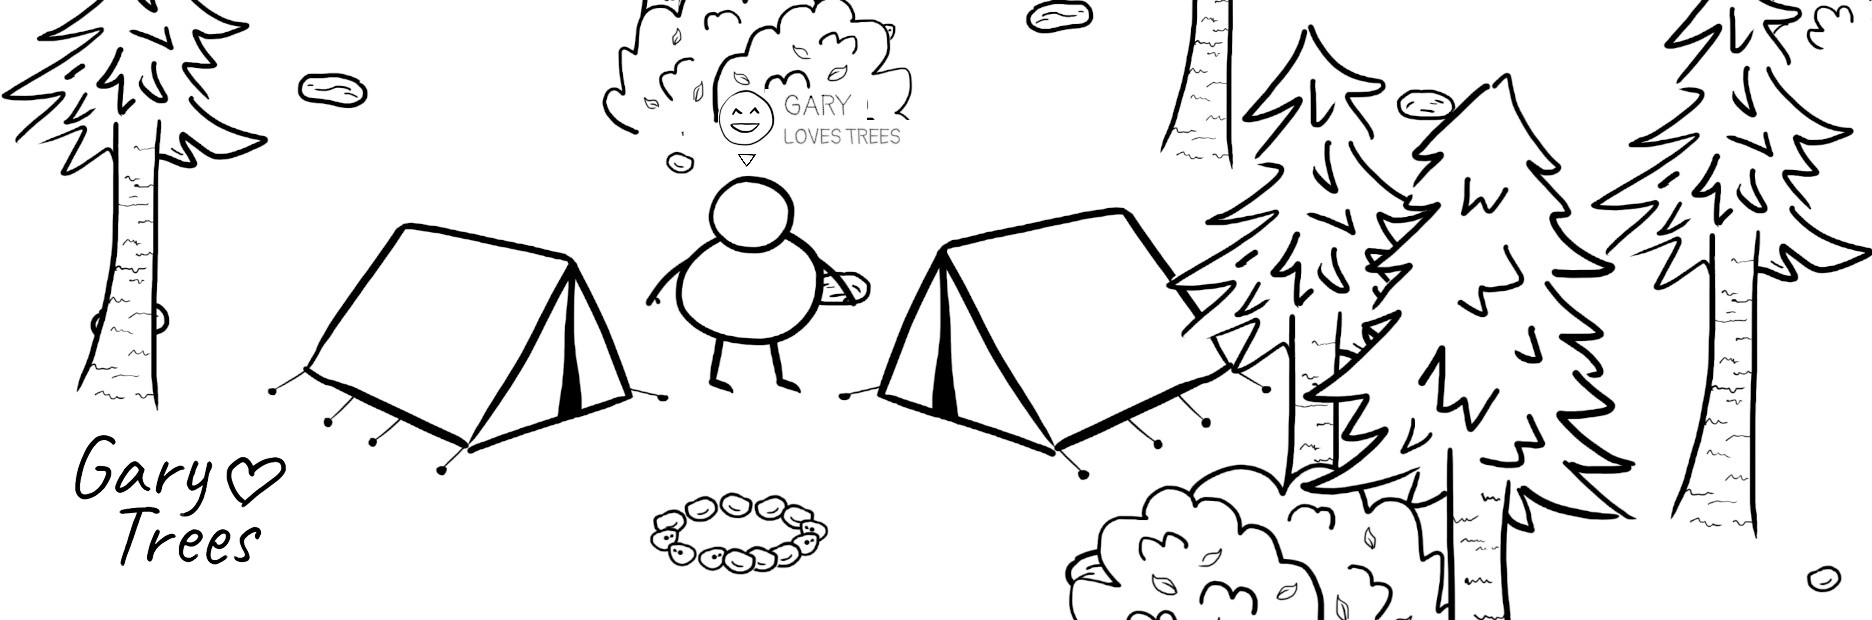 Gary Loves Trees